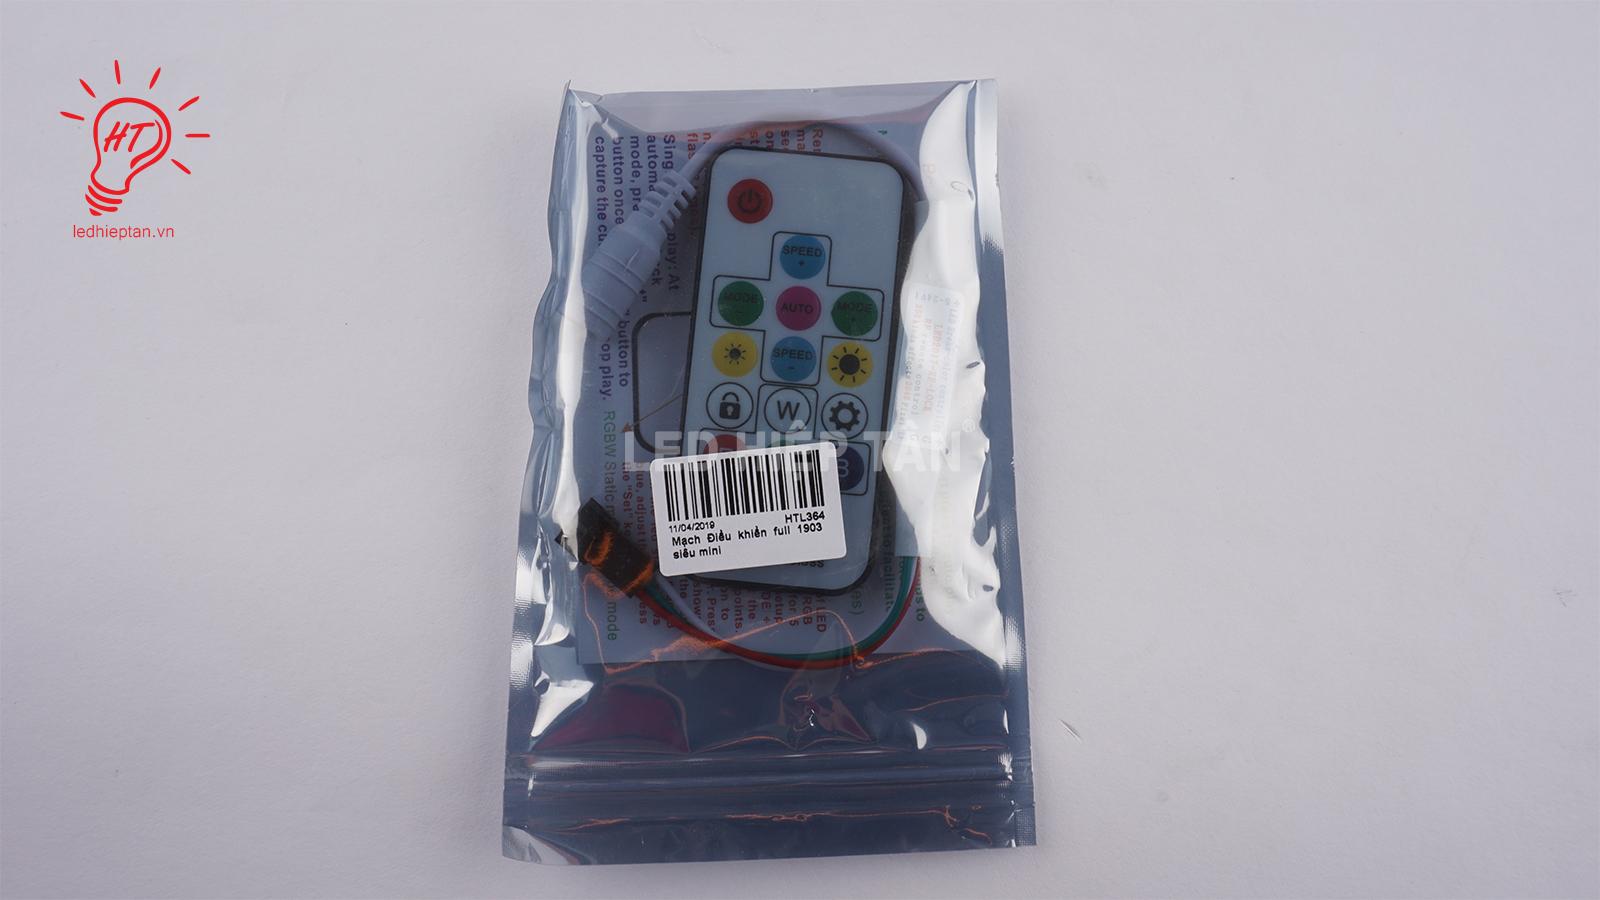 Điều khiển siêu mini cho Led Fullcolor IC1903 - Led Hiệp Tân - Vật tư led Untitled-1-97504ad0-9d76-45e4-9f27-fe050989ded9